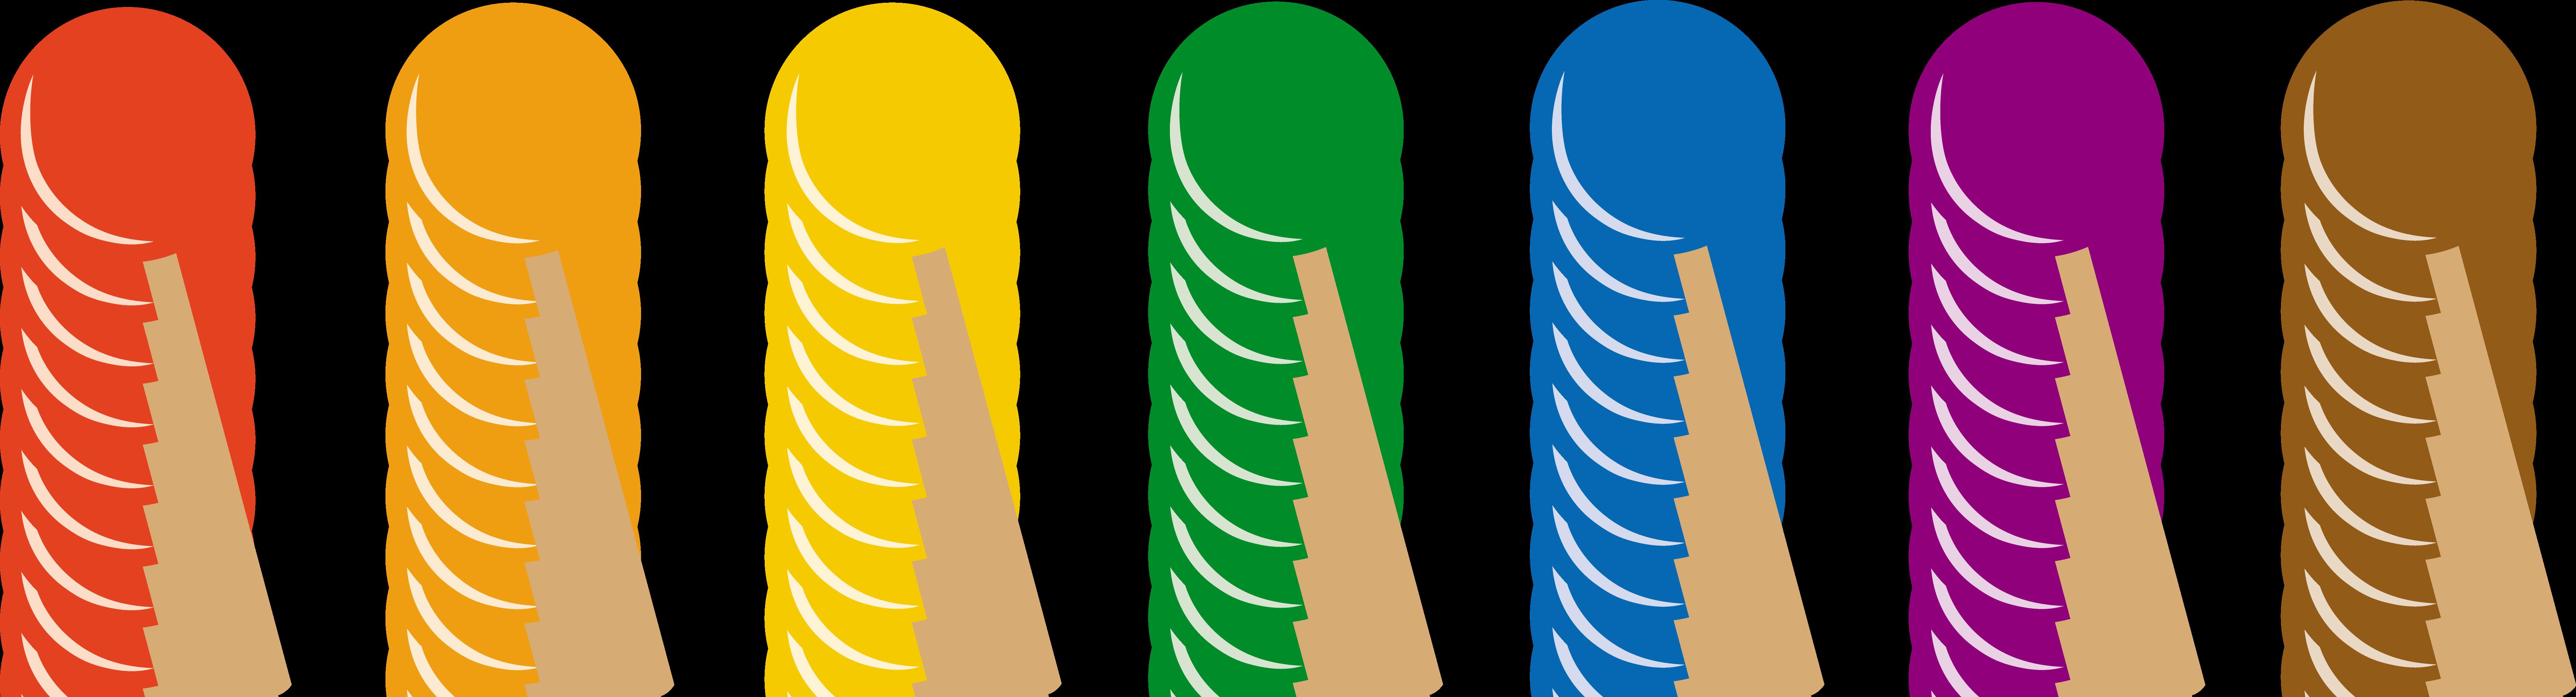 7438x2012 Lollipops In Seven Flavors